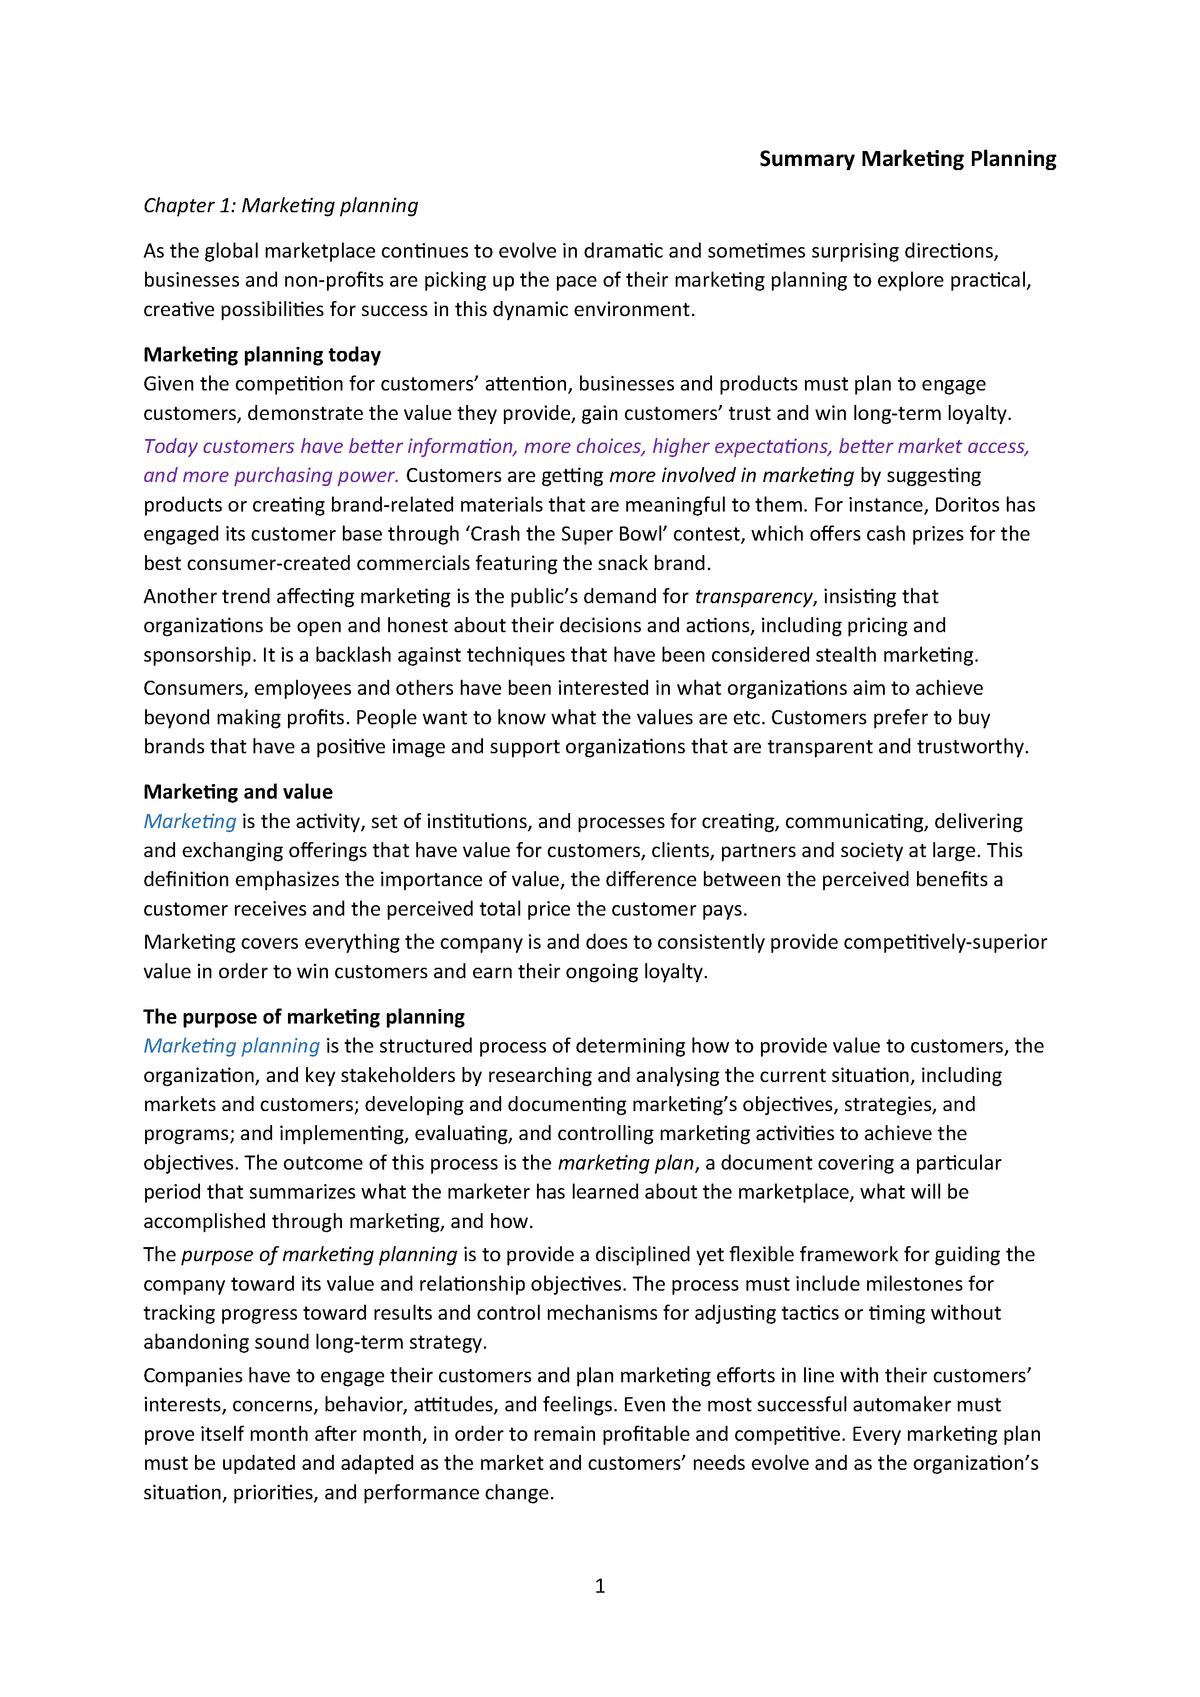 Summary Fundamentals of Strategy 26 Jul 2015 - StuDocu